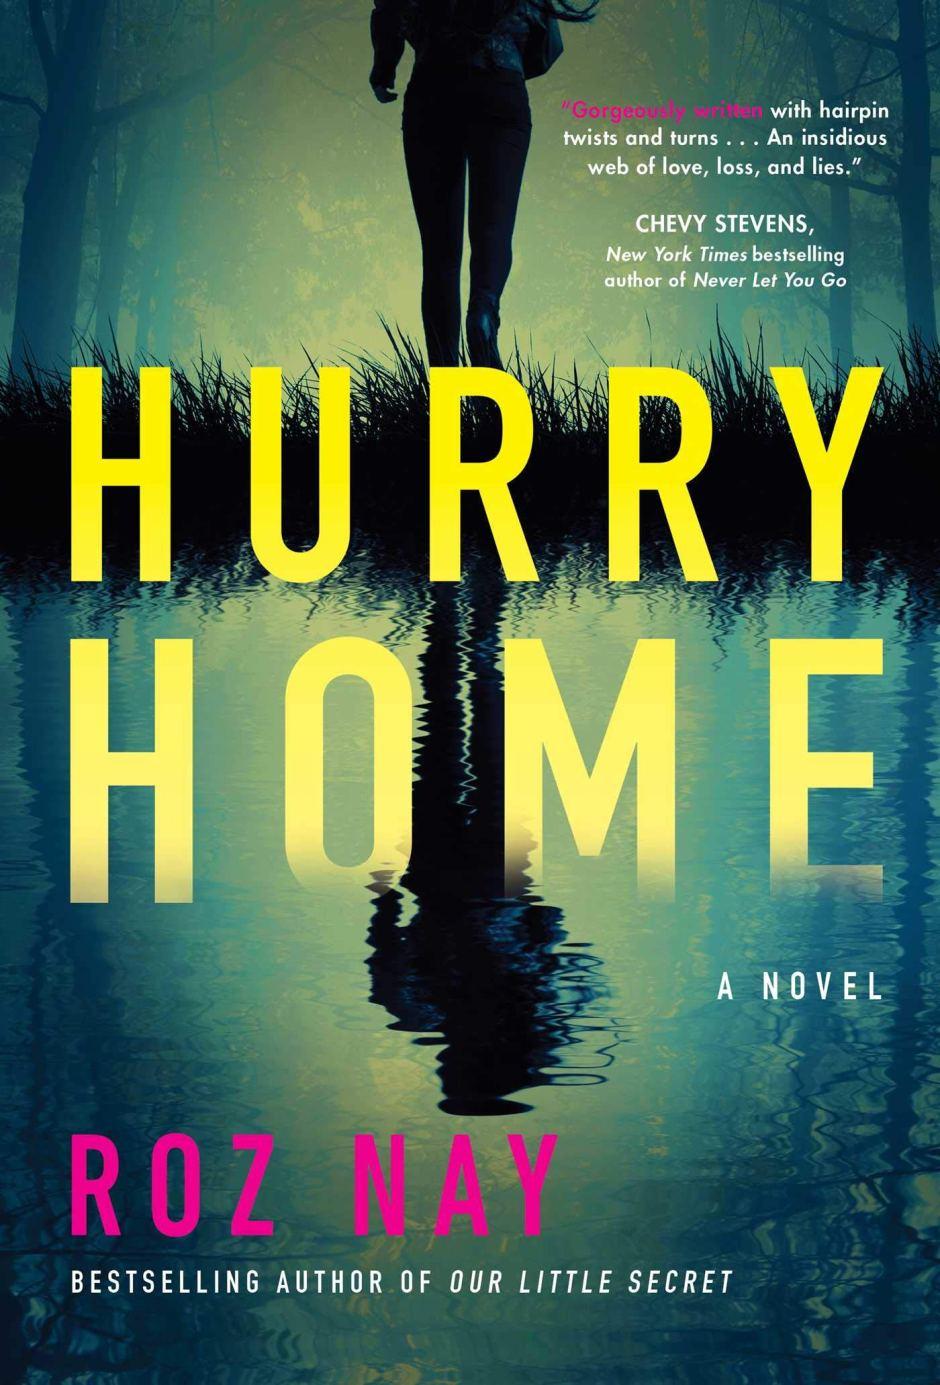 Hurry Home: Amazon.ca: Nay, Roz: Books